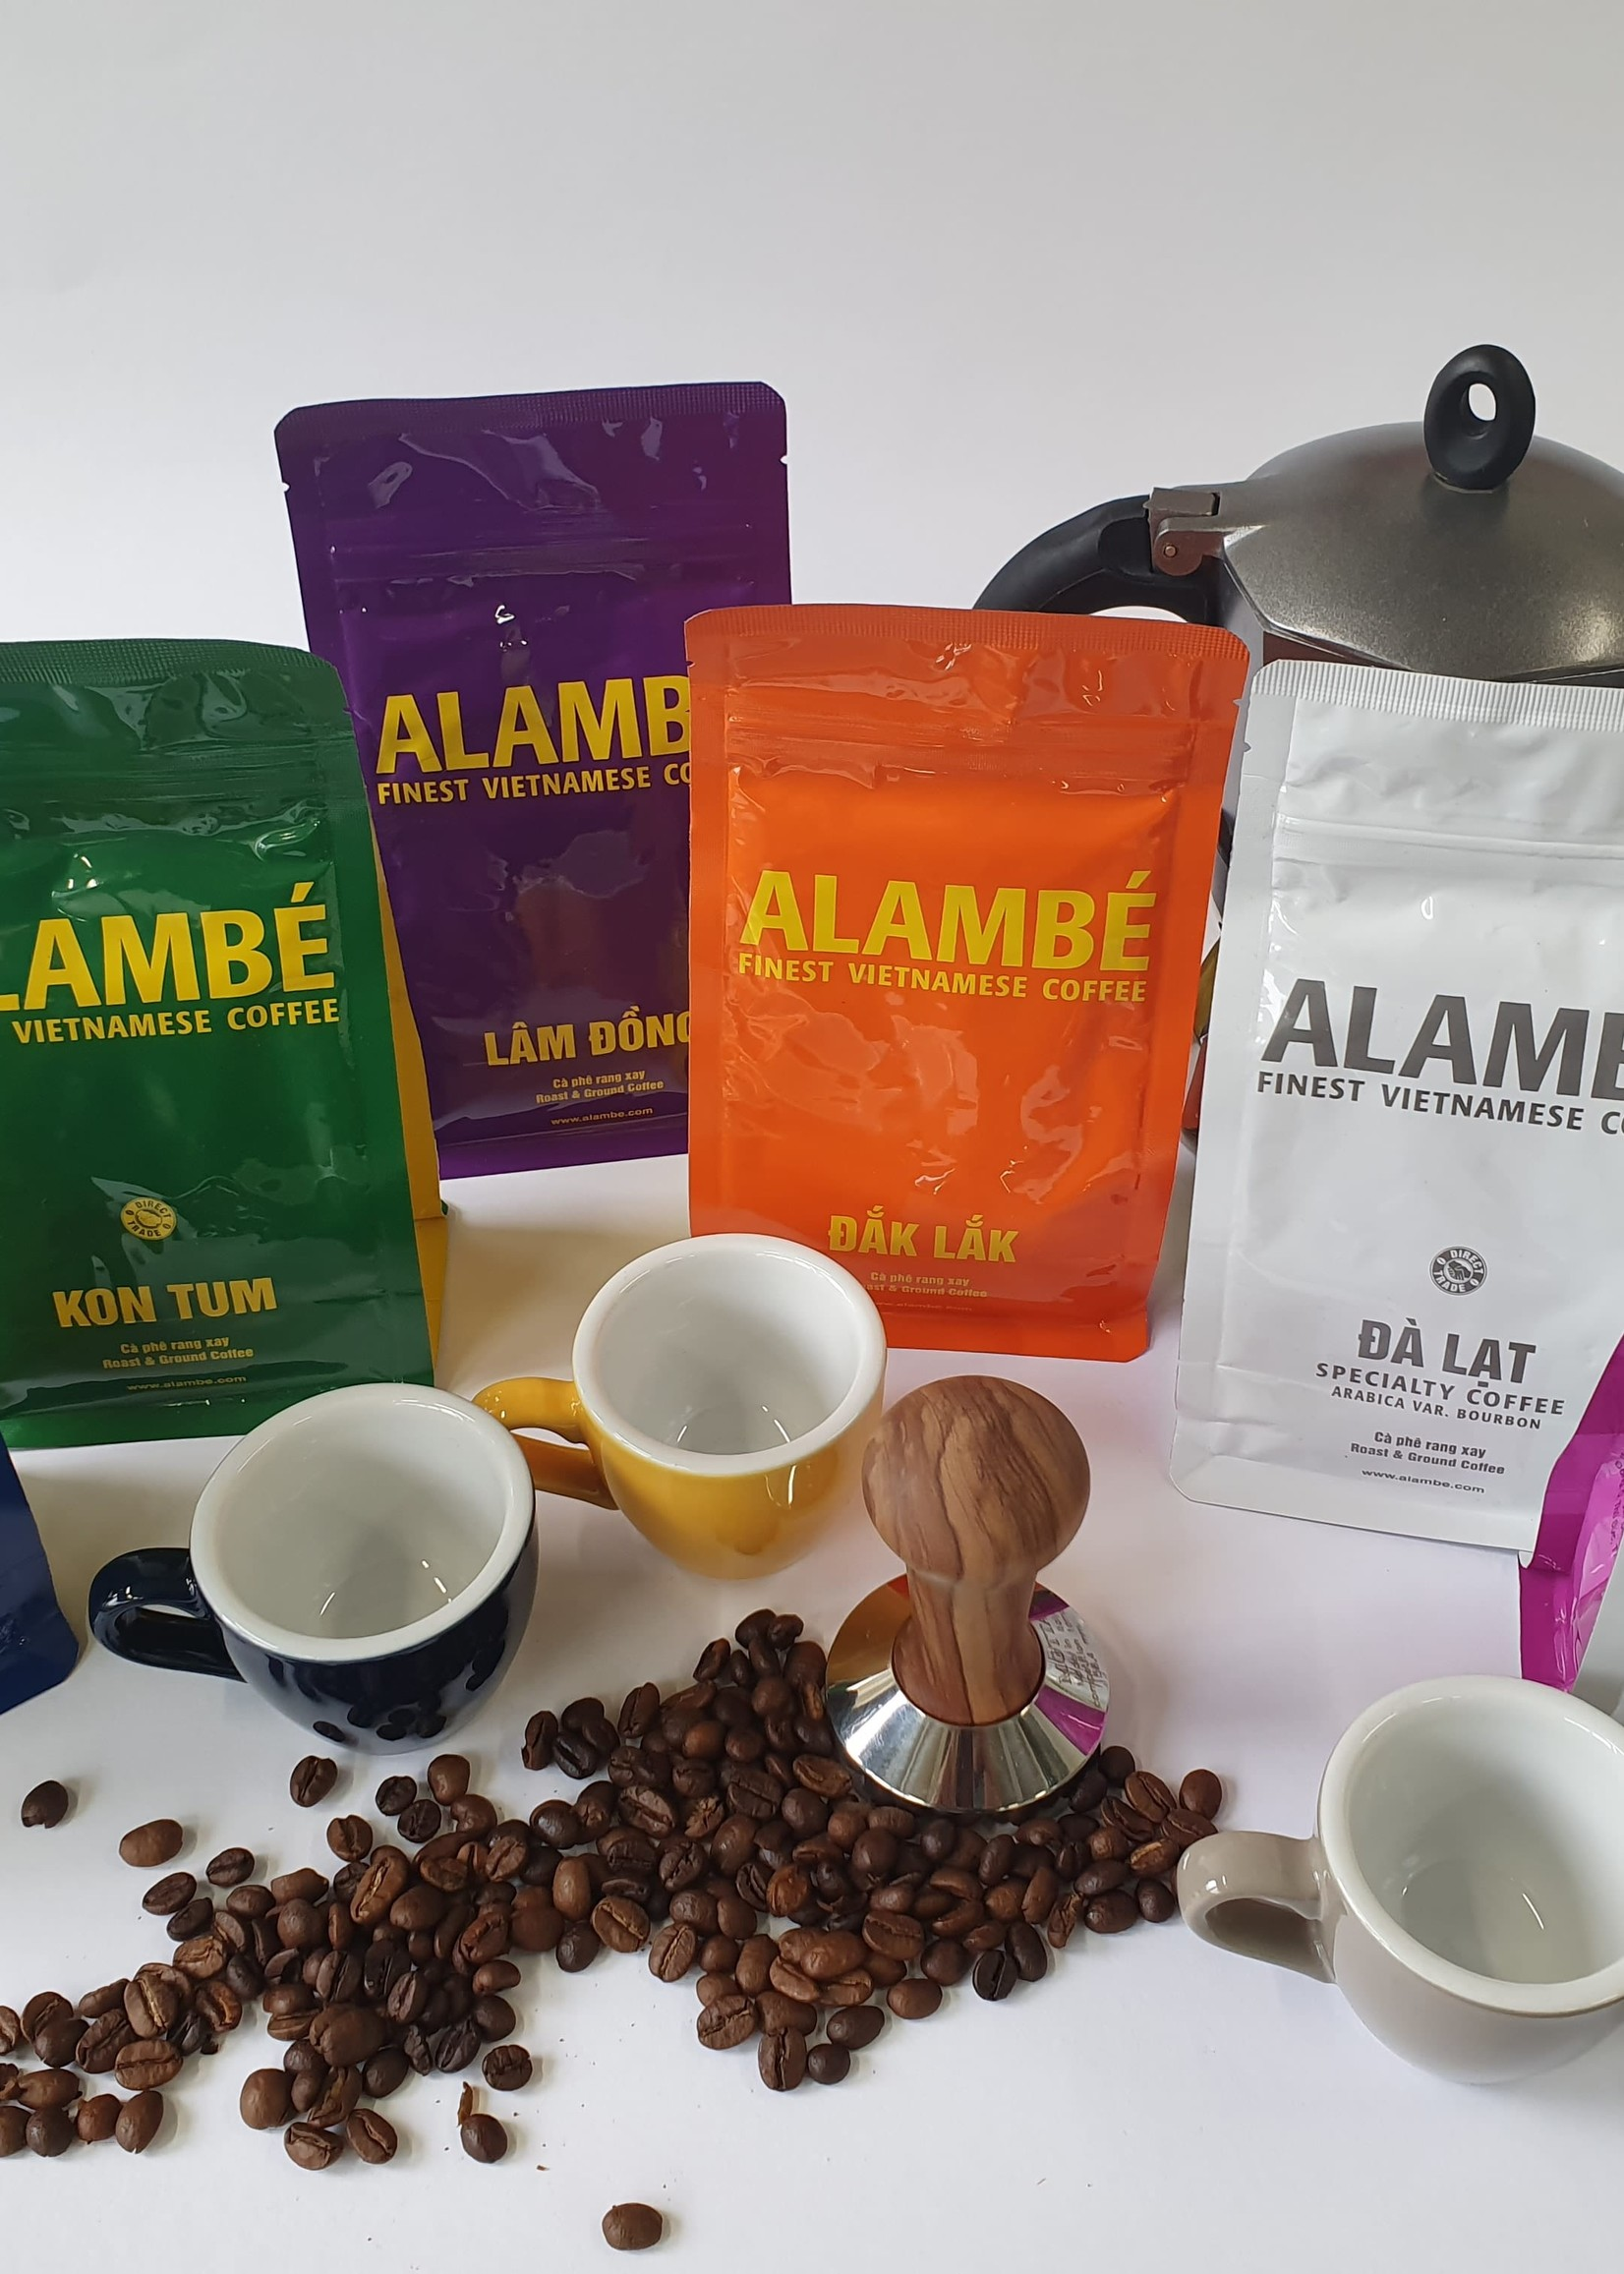 Alambé - Finest Vietnamese Coffee The Alambé Coffee Discovery Pack (ground)